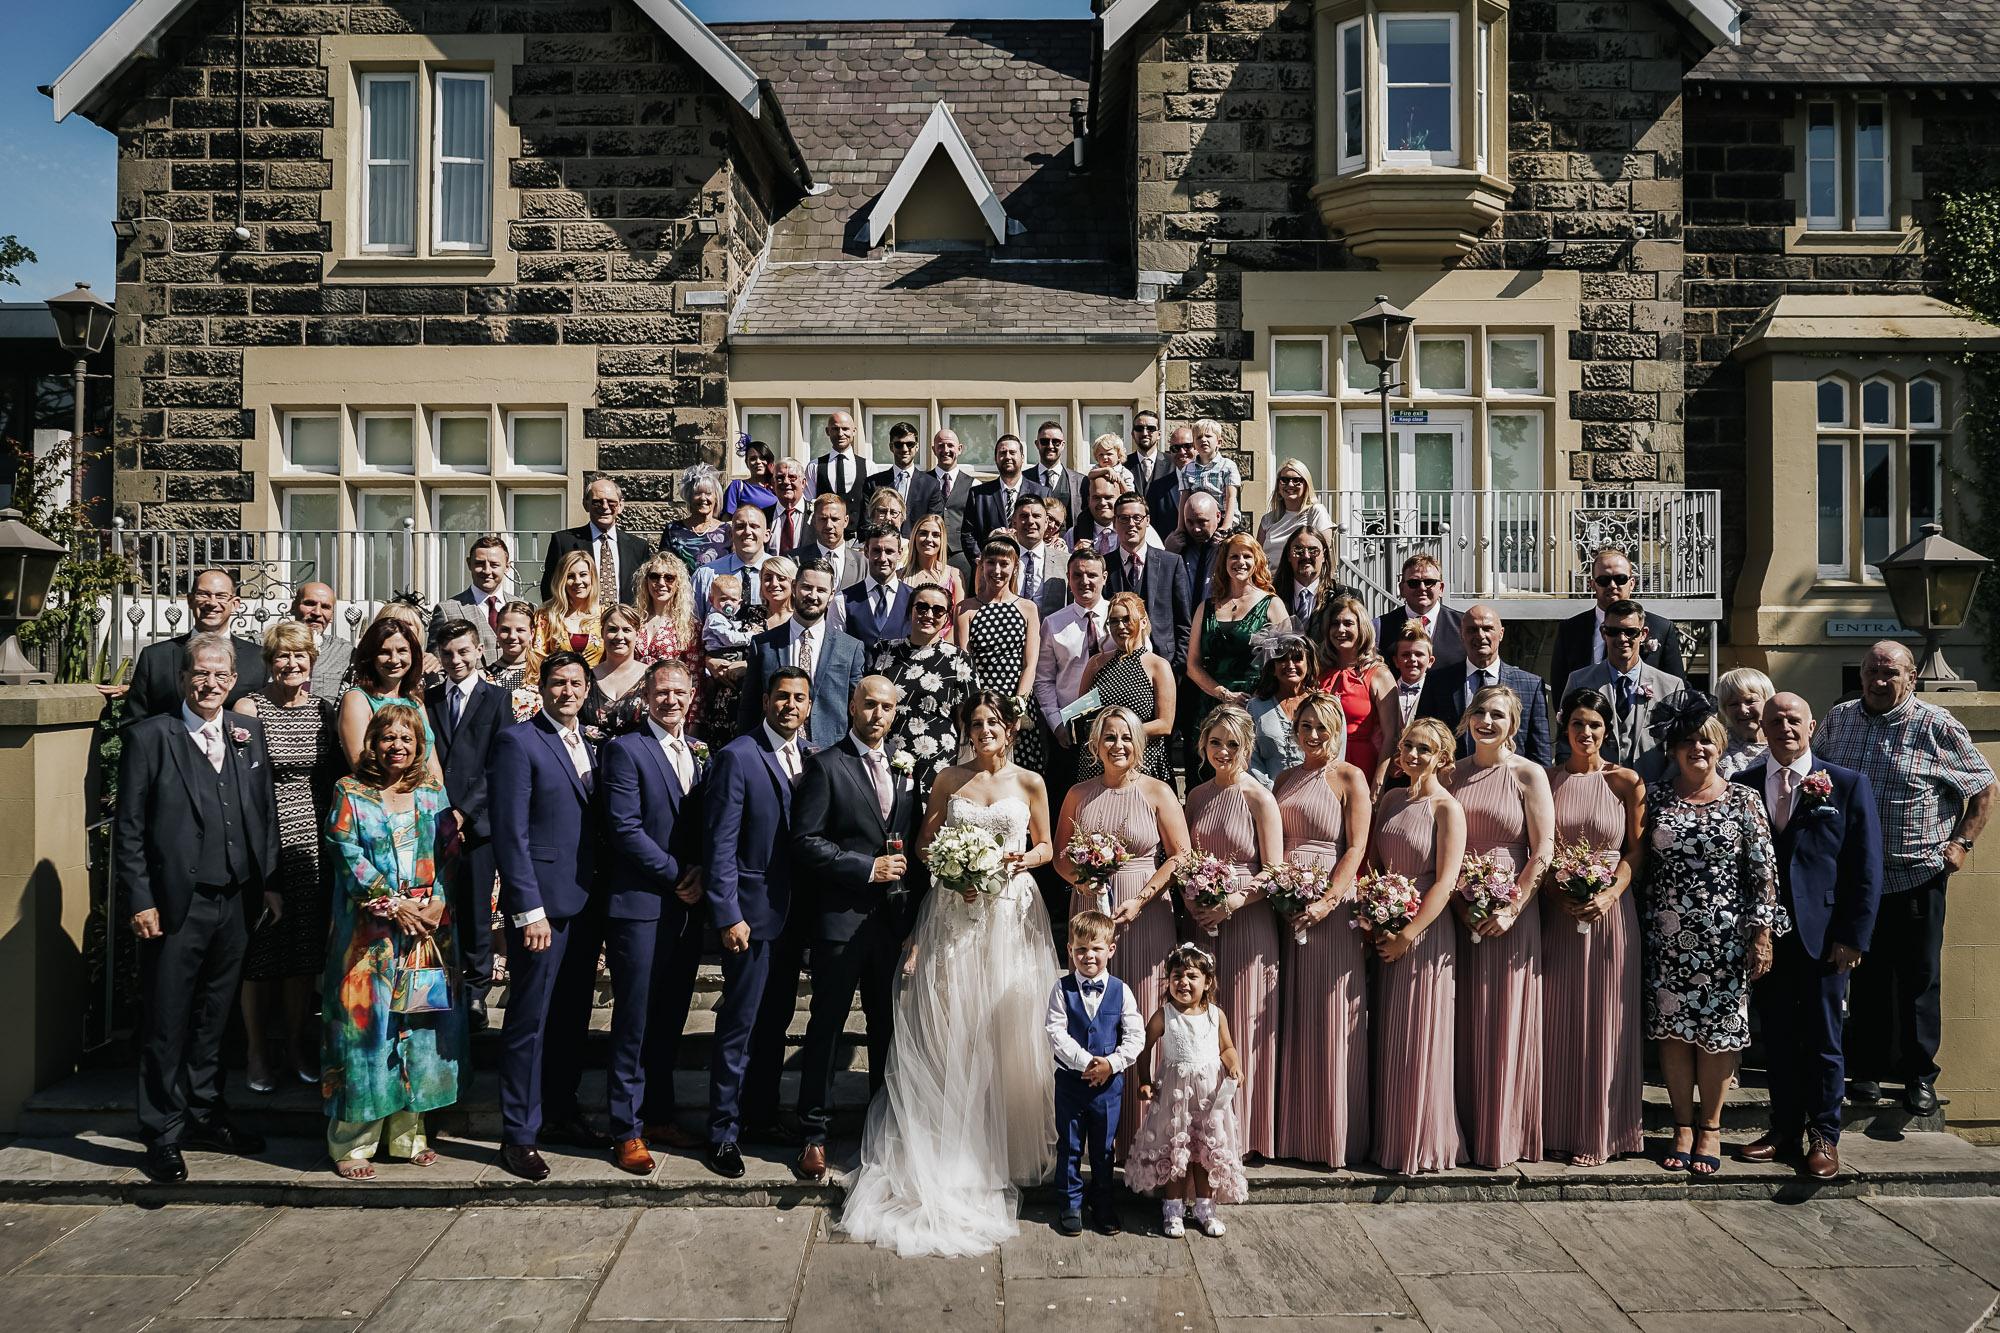 West Tower Wedding Venue Orkskirk Lancashire Wedding Photography cheshire wedding photographer (18 of 47).jpg